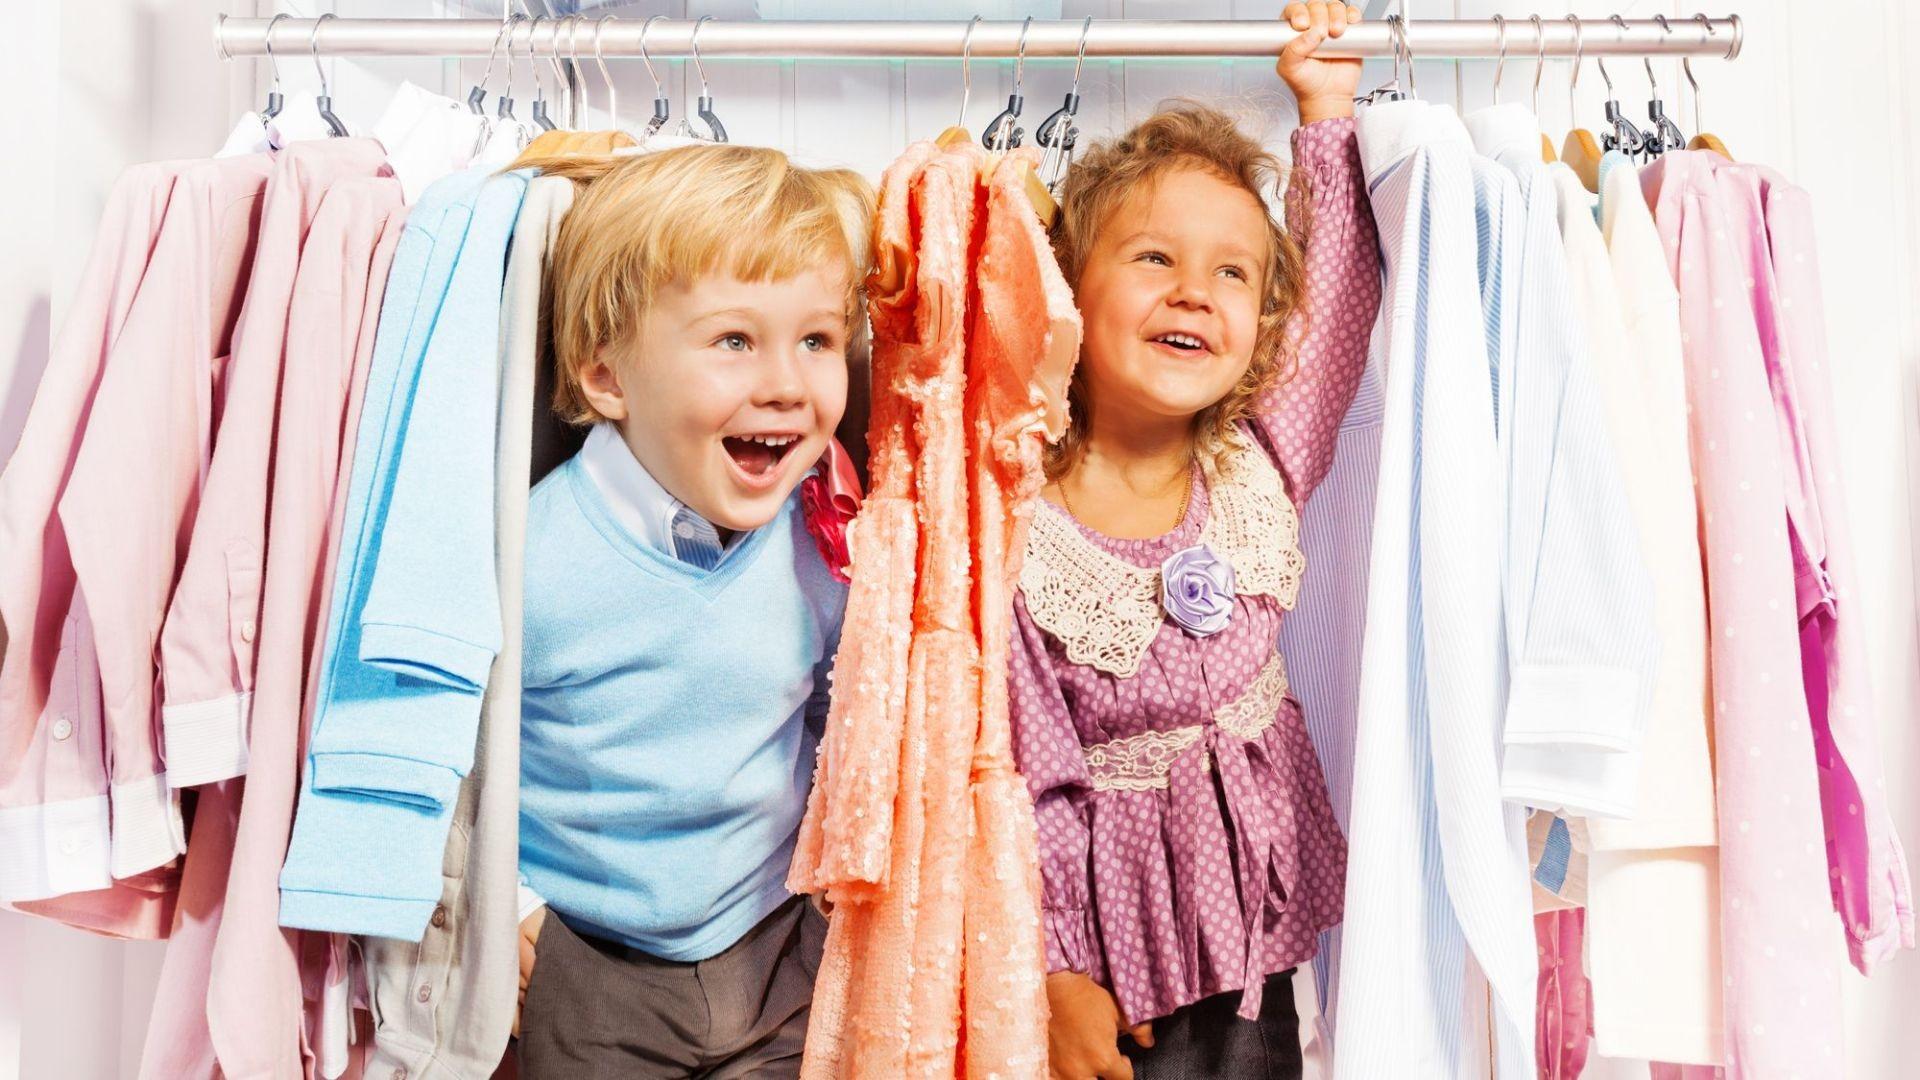 Tienda de ropa infantil en Aguadulce